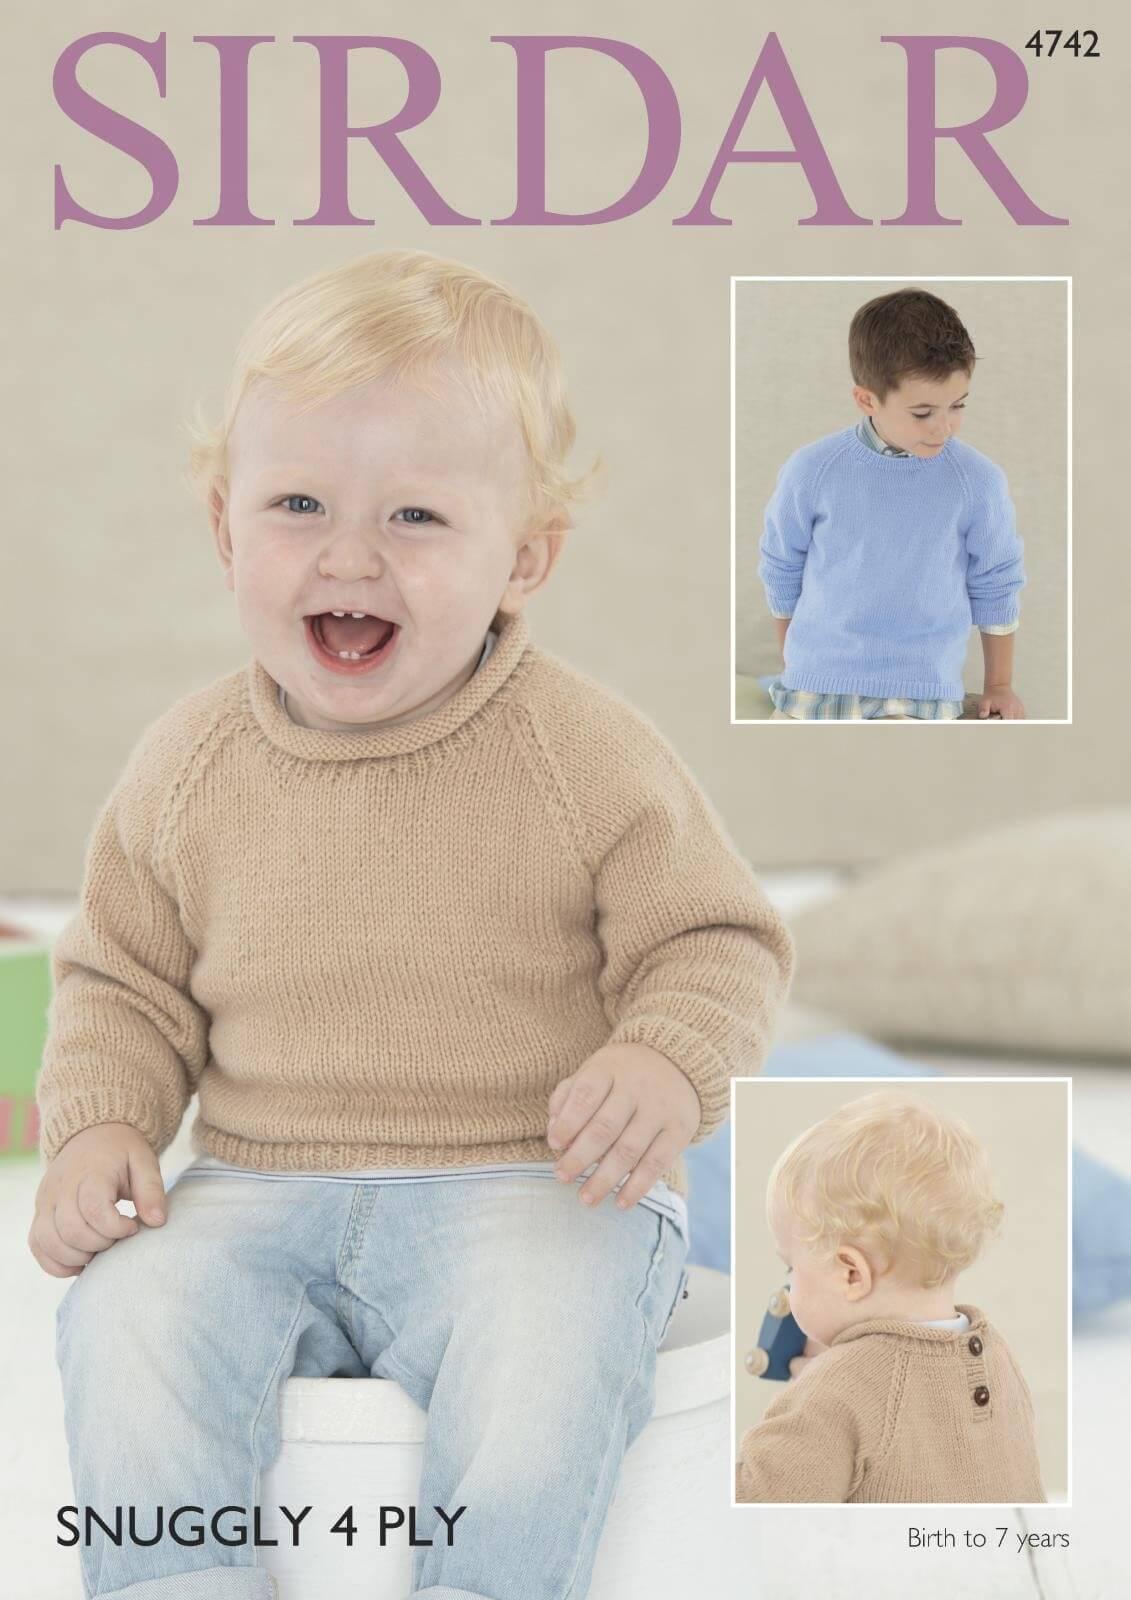 Sirdar Knitting Pattern 4742 Baby Childrens Roll Neck Round Neck Sweater Jumper 0-7 Years